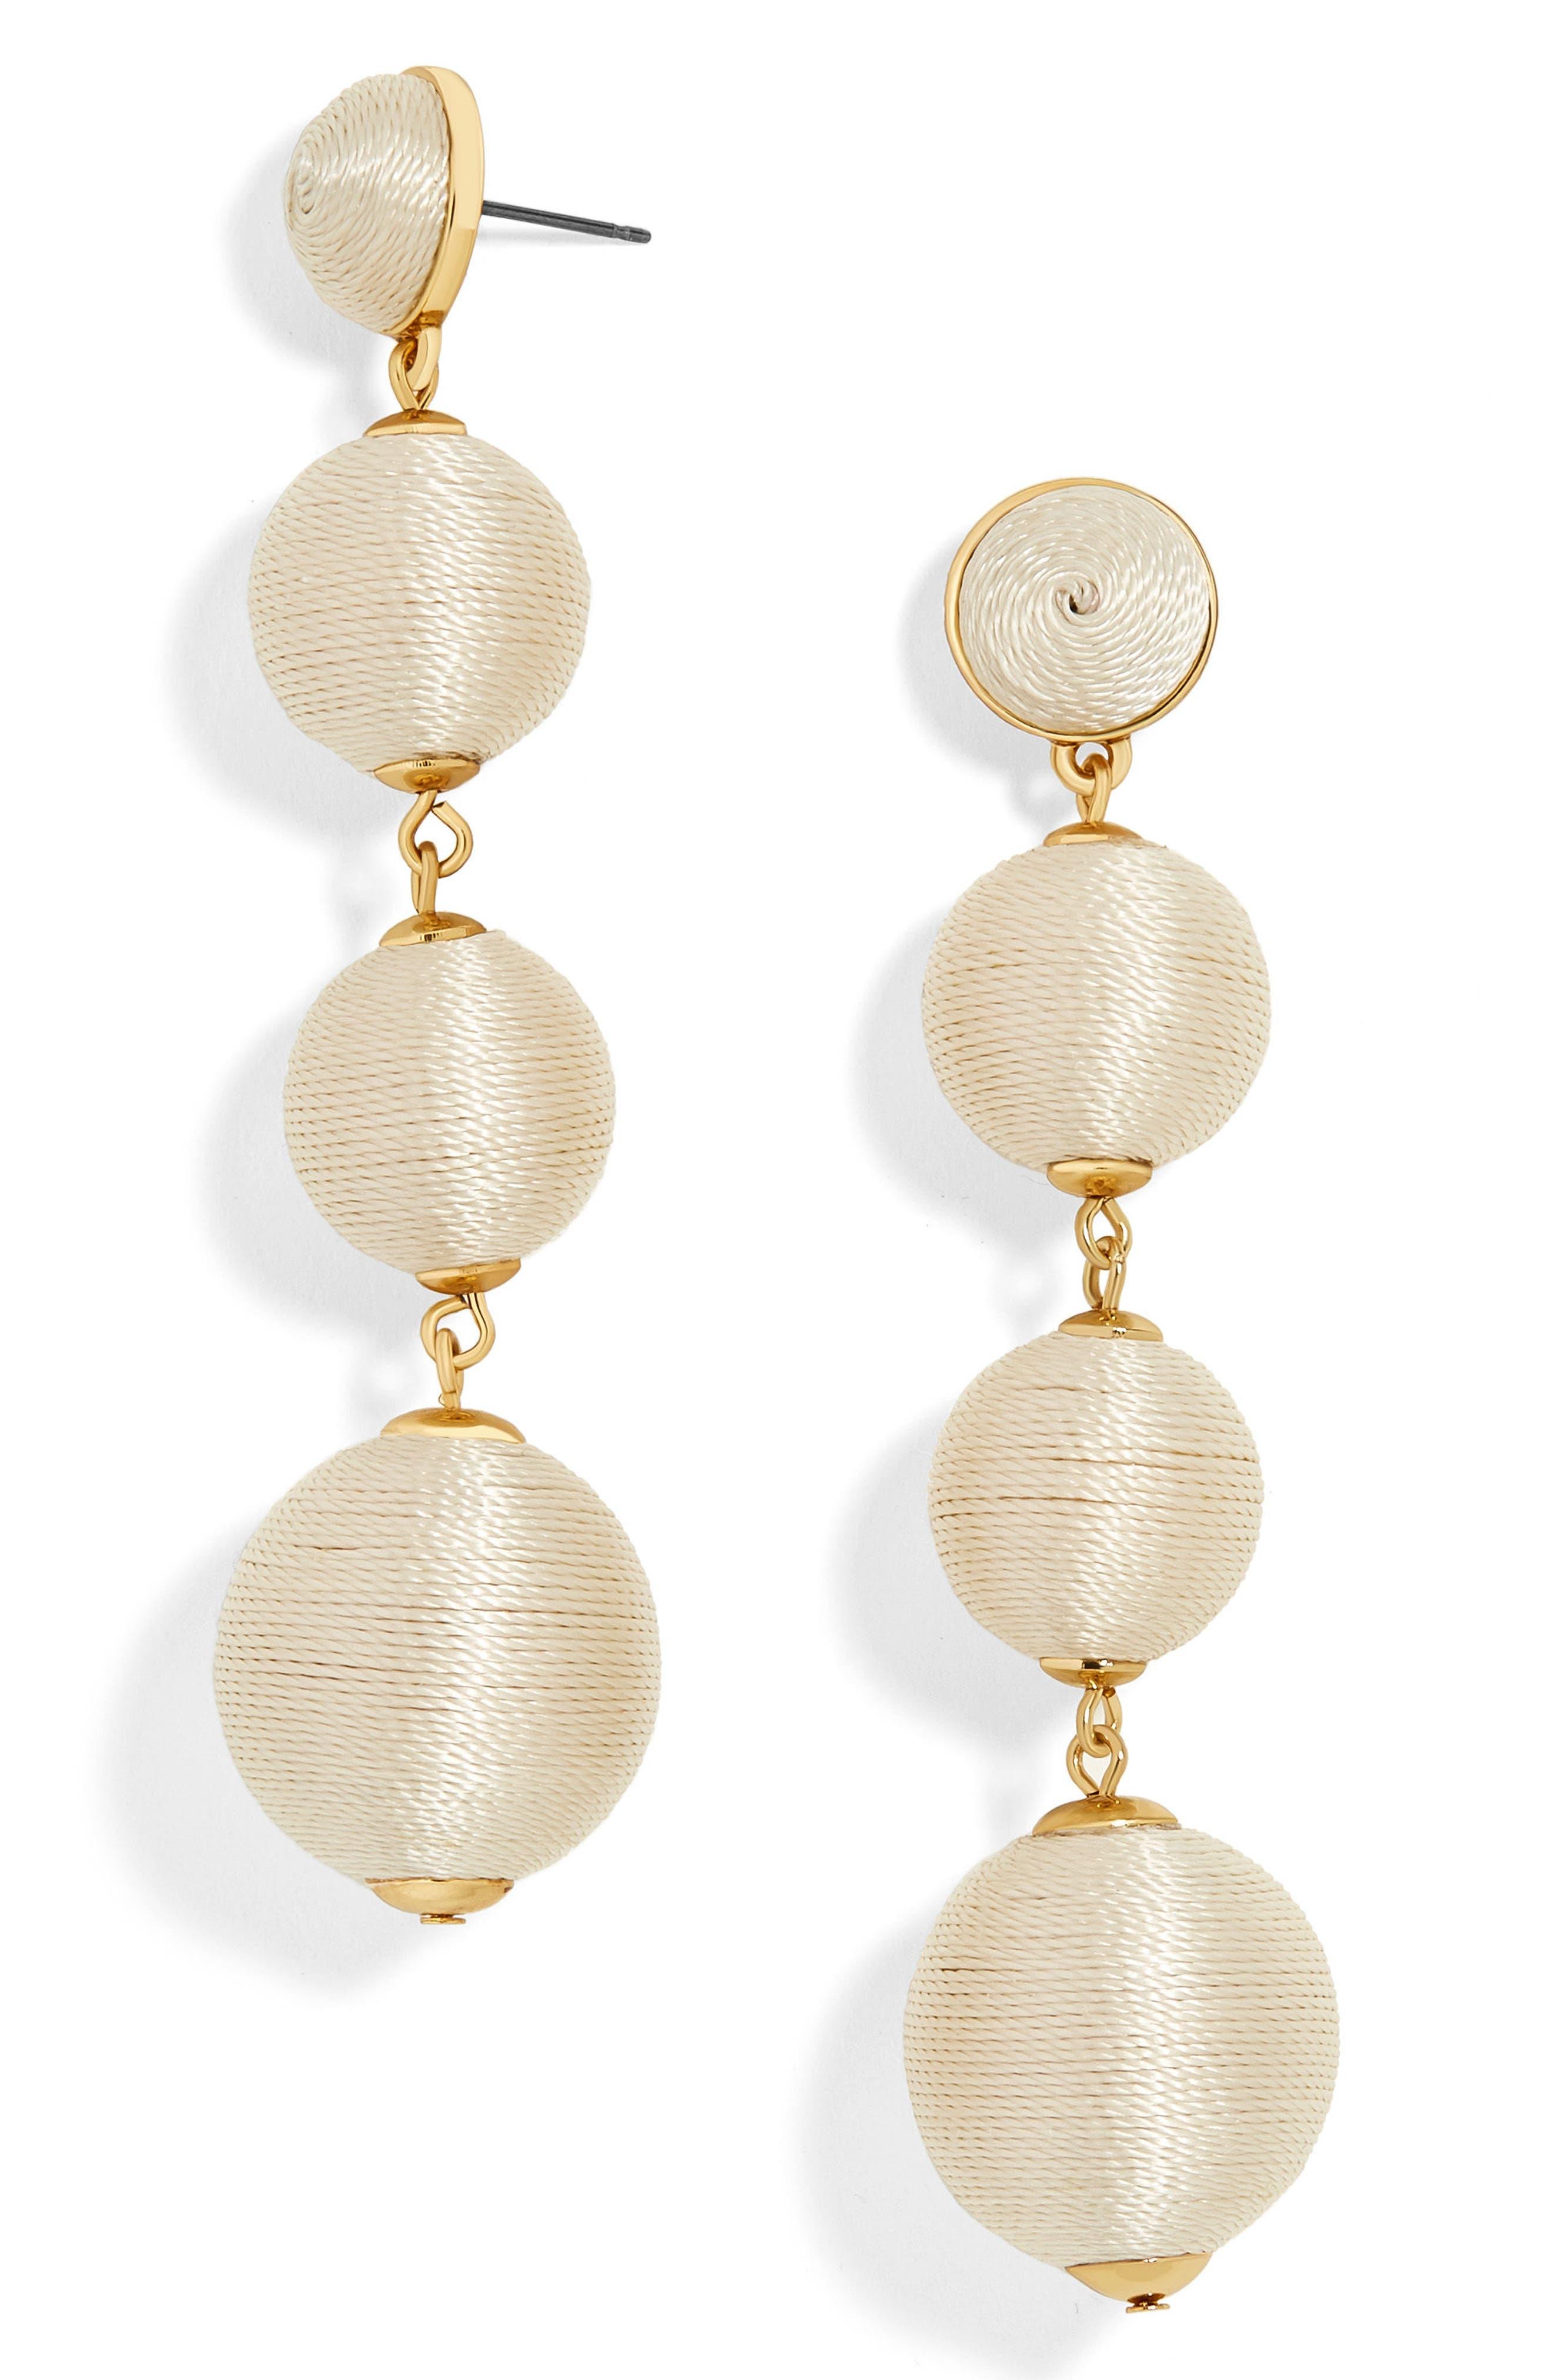 Criselda Ball Shoulder Duster Earrings,                             Main thumbnail 2, color,